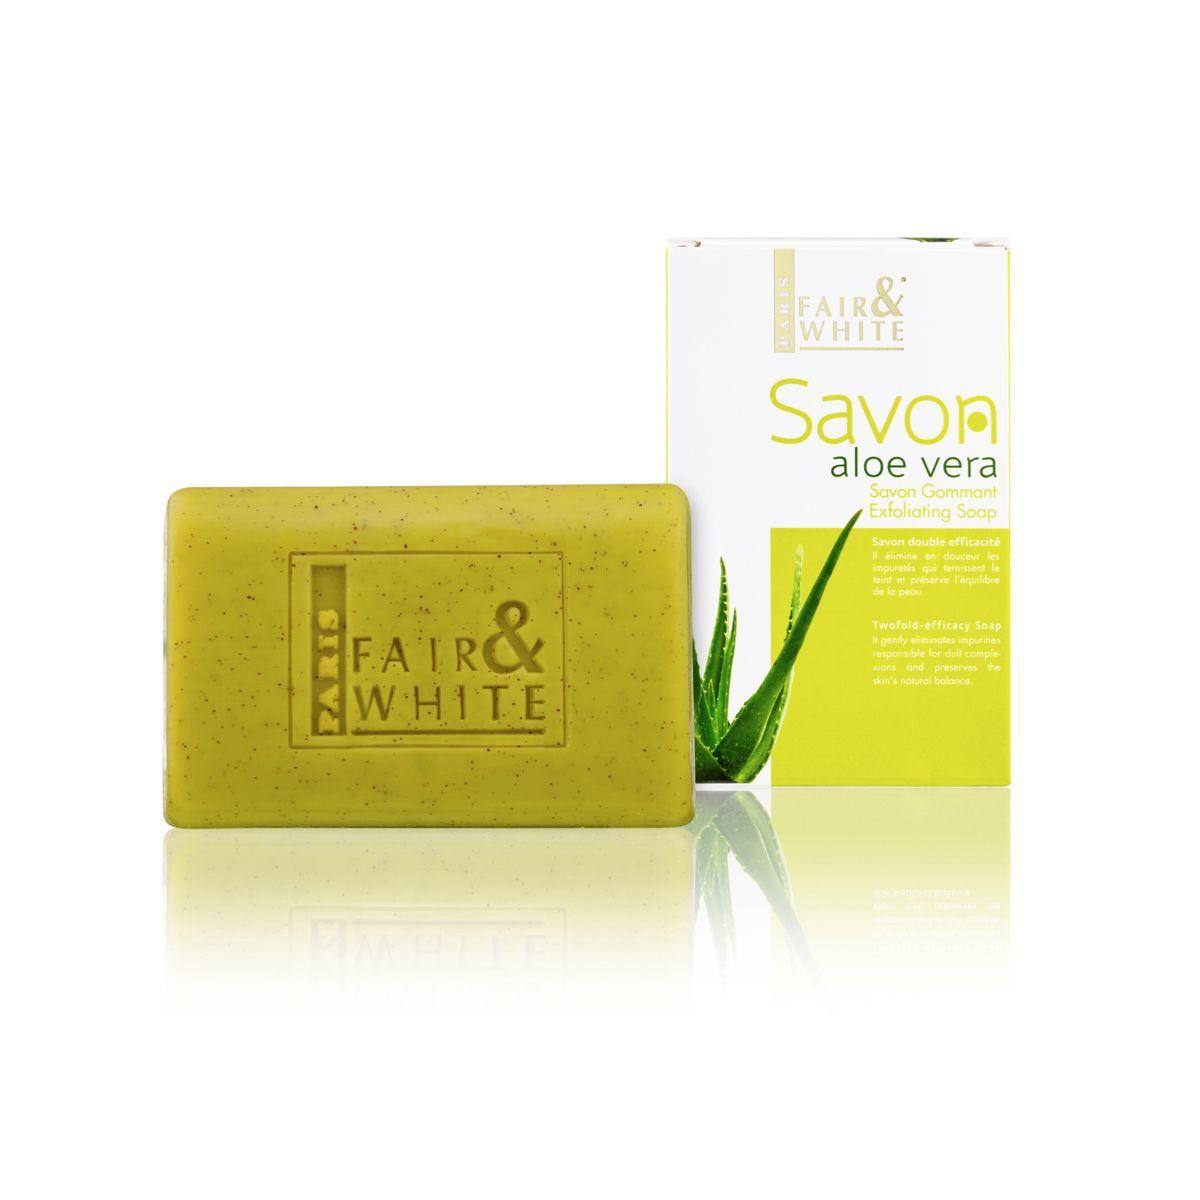 Fair & White Original Aloe Vera Savon Gommant Exfoliating Soap - 200g